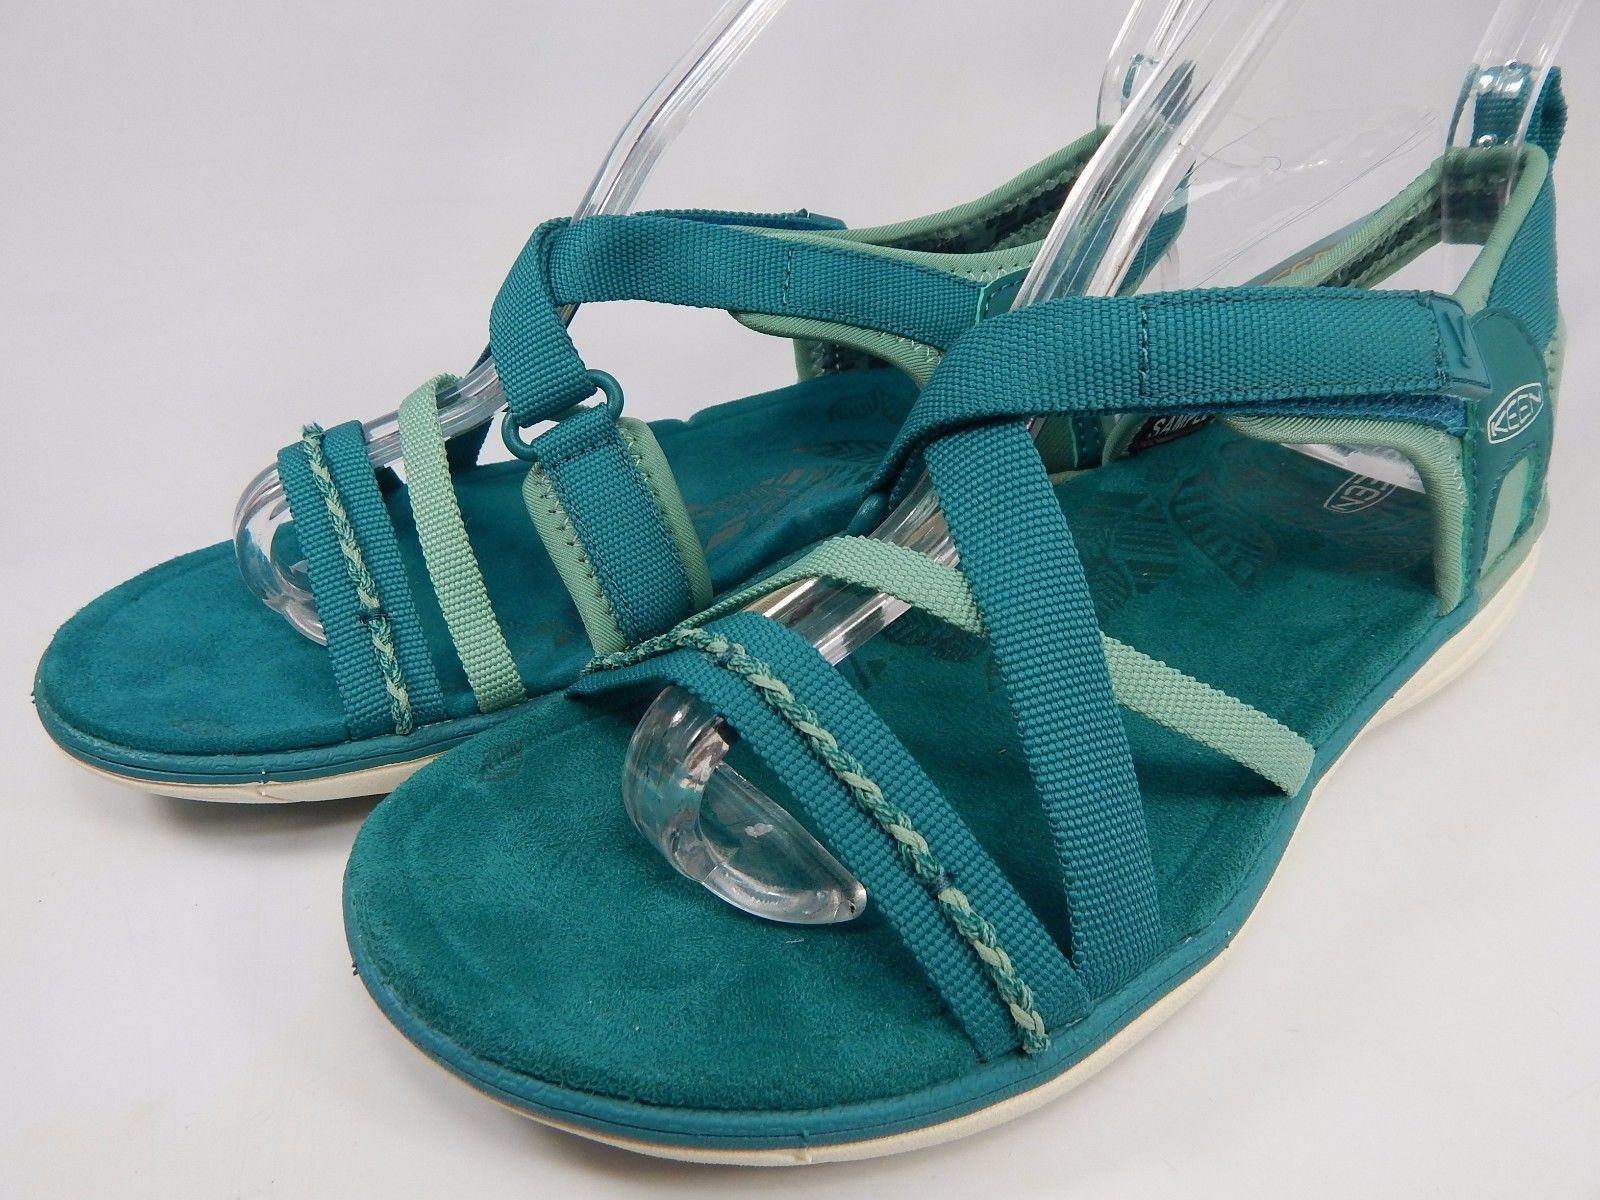 Keen Maya Strap Women's Sports Sandals Sz US 7 M (B) EU 37.5 Malachite Everglade